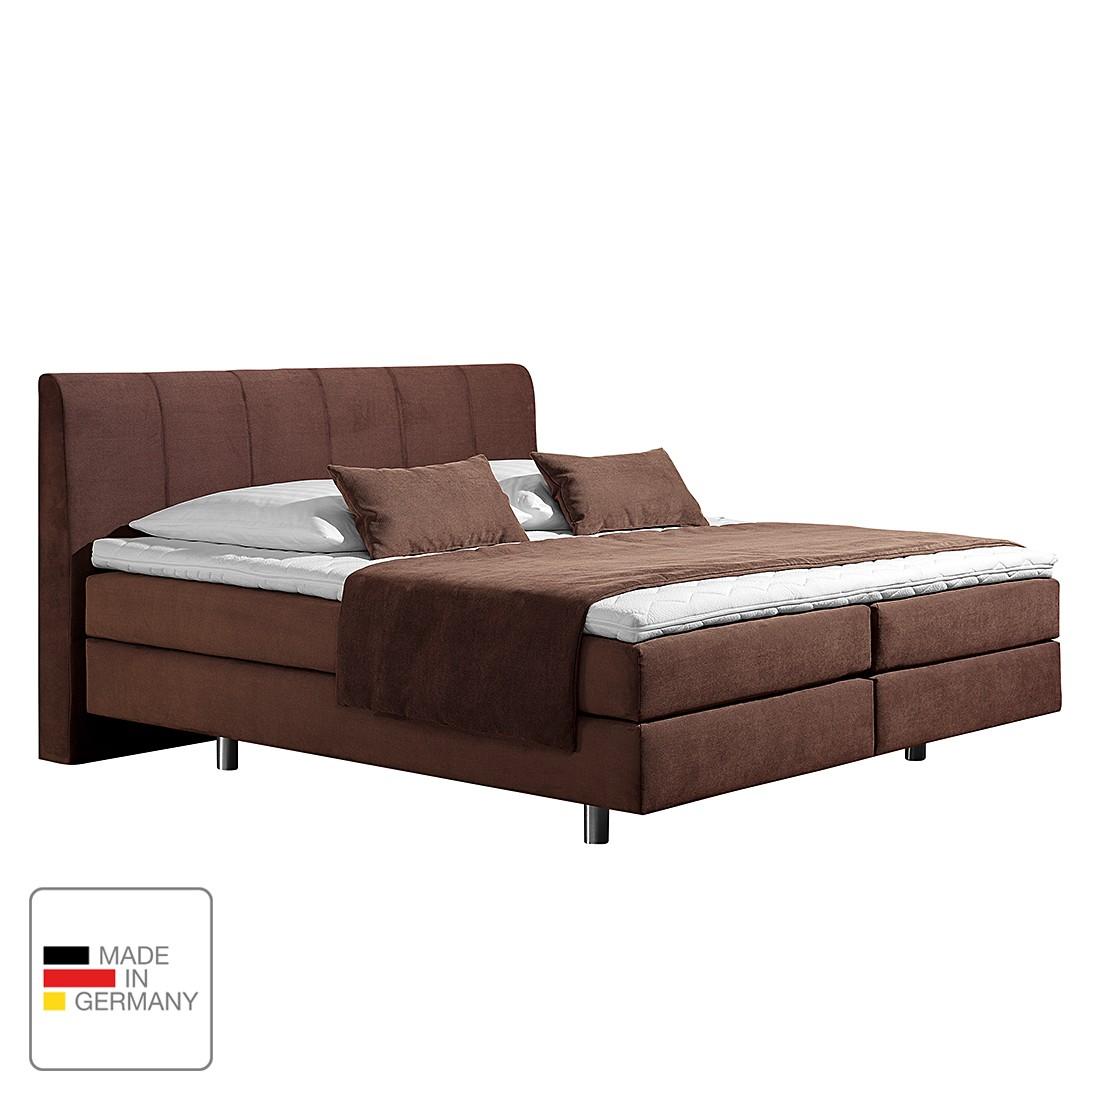 boxspringbett baila webstoff 160 x 200cm h2 bis 80 kg bonellfederkernmatratze. Black Bedroom Furniture Sets. Home Design Ideas